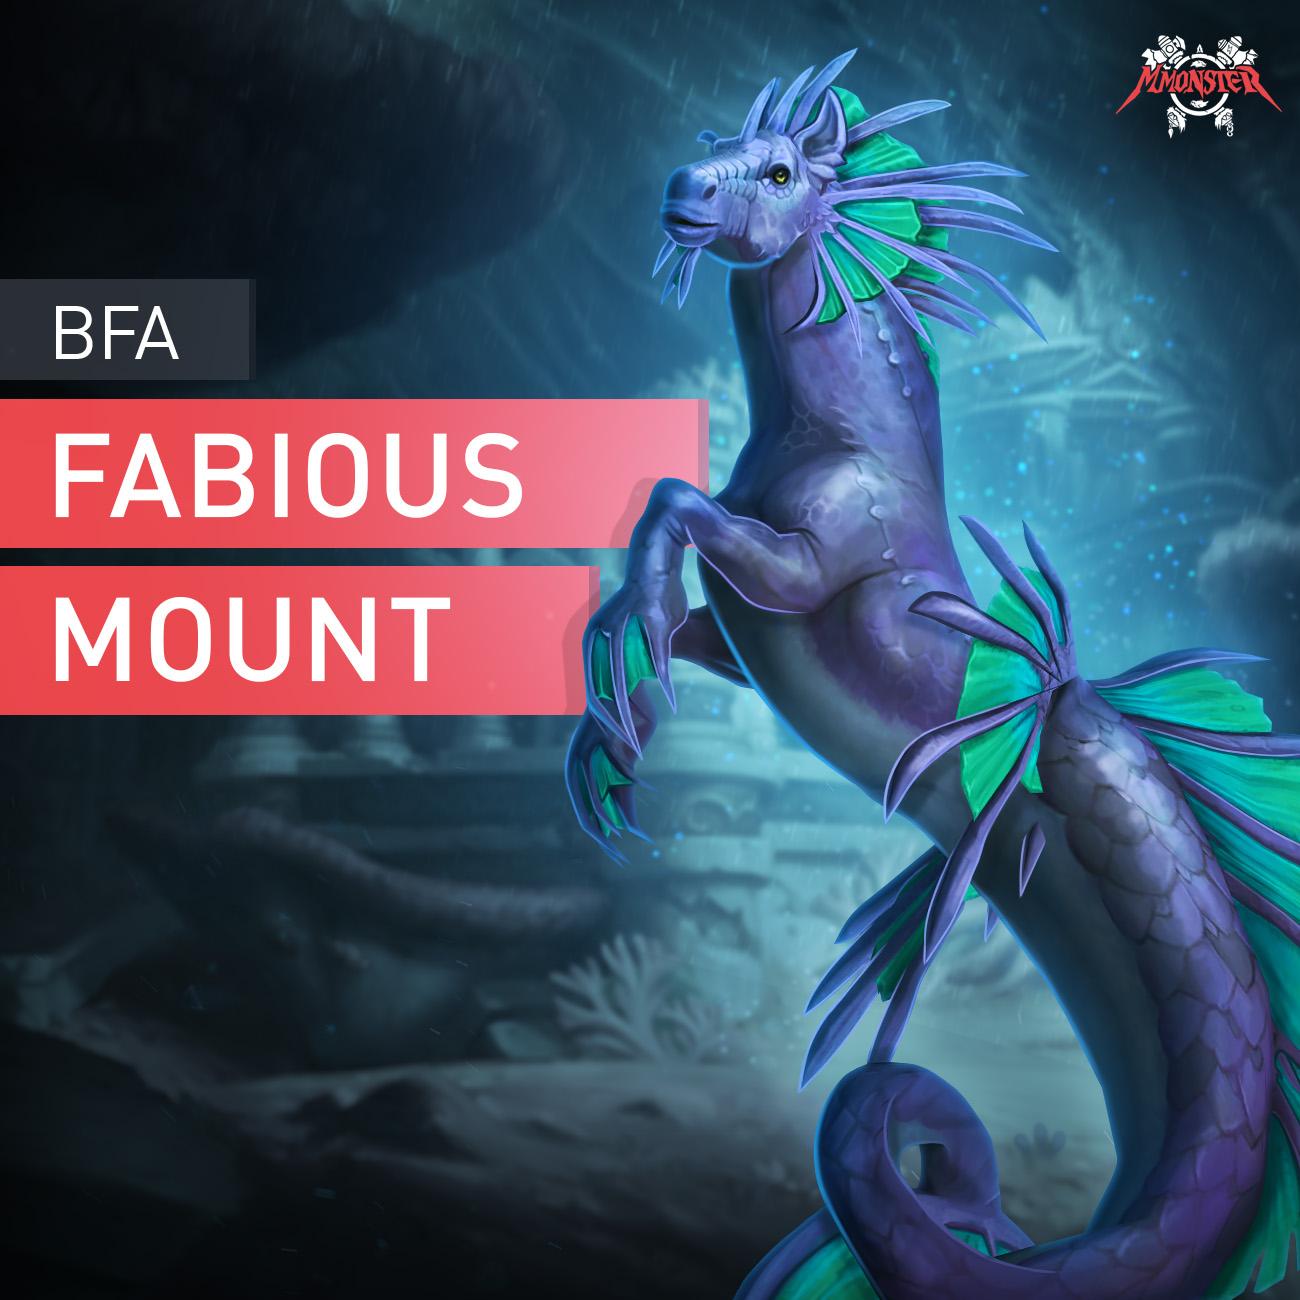 Fabious Mount